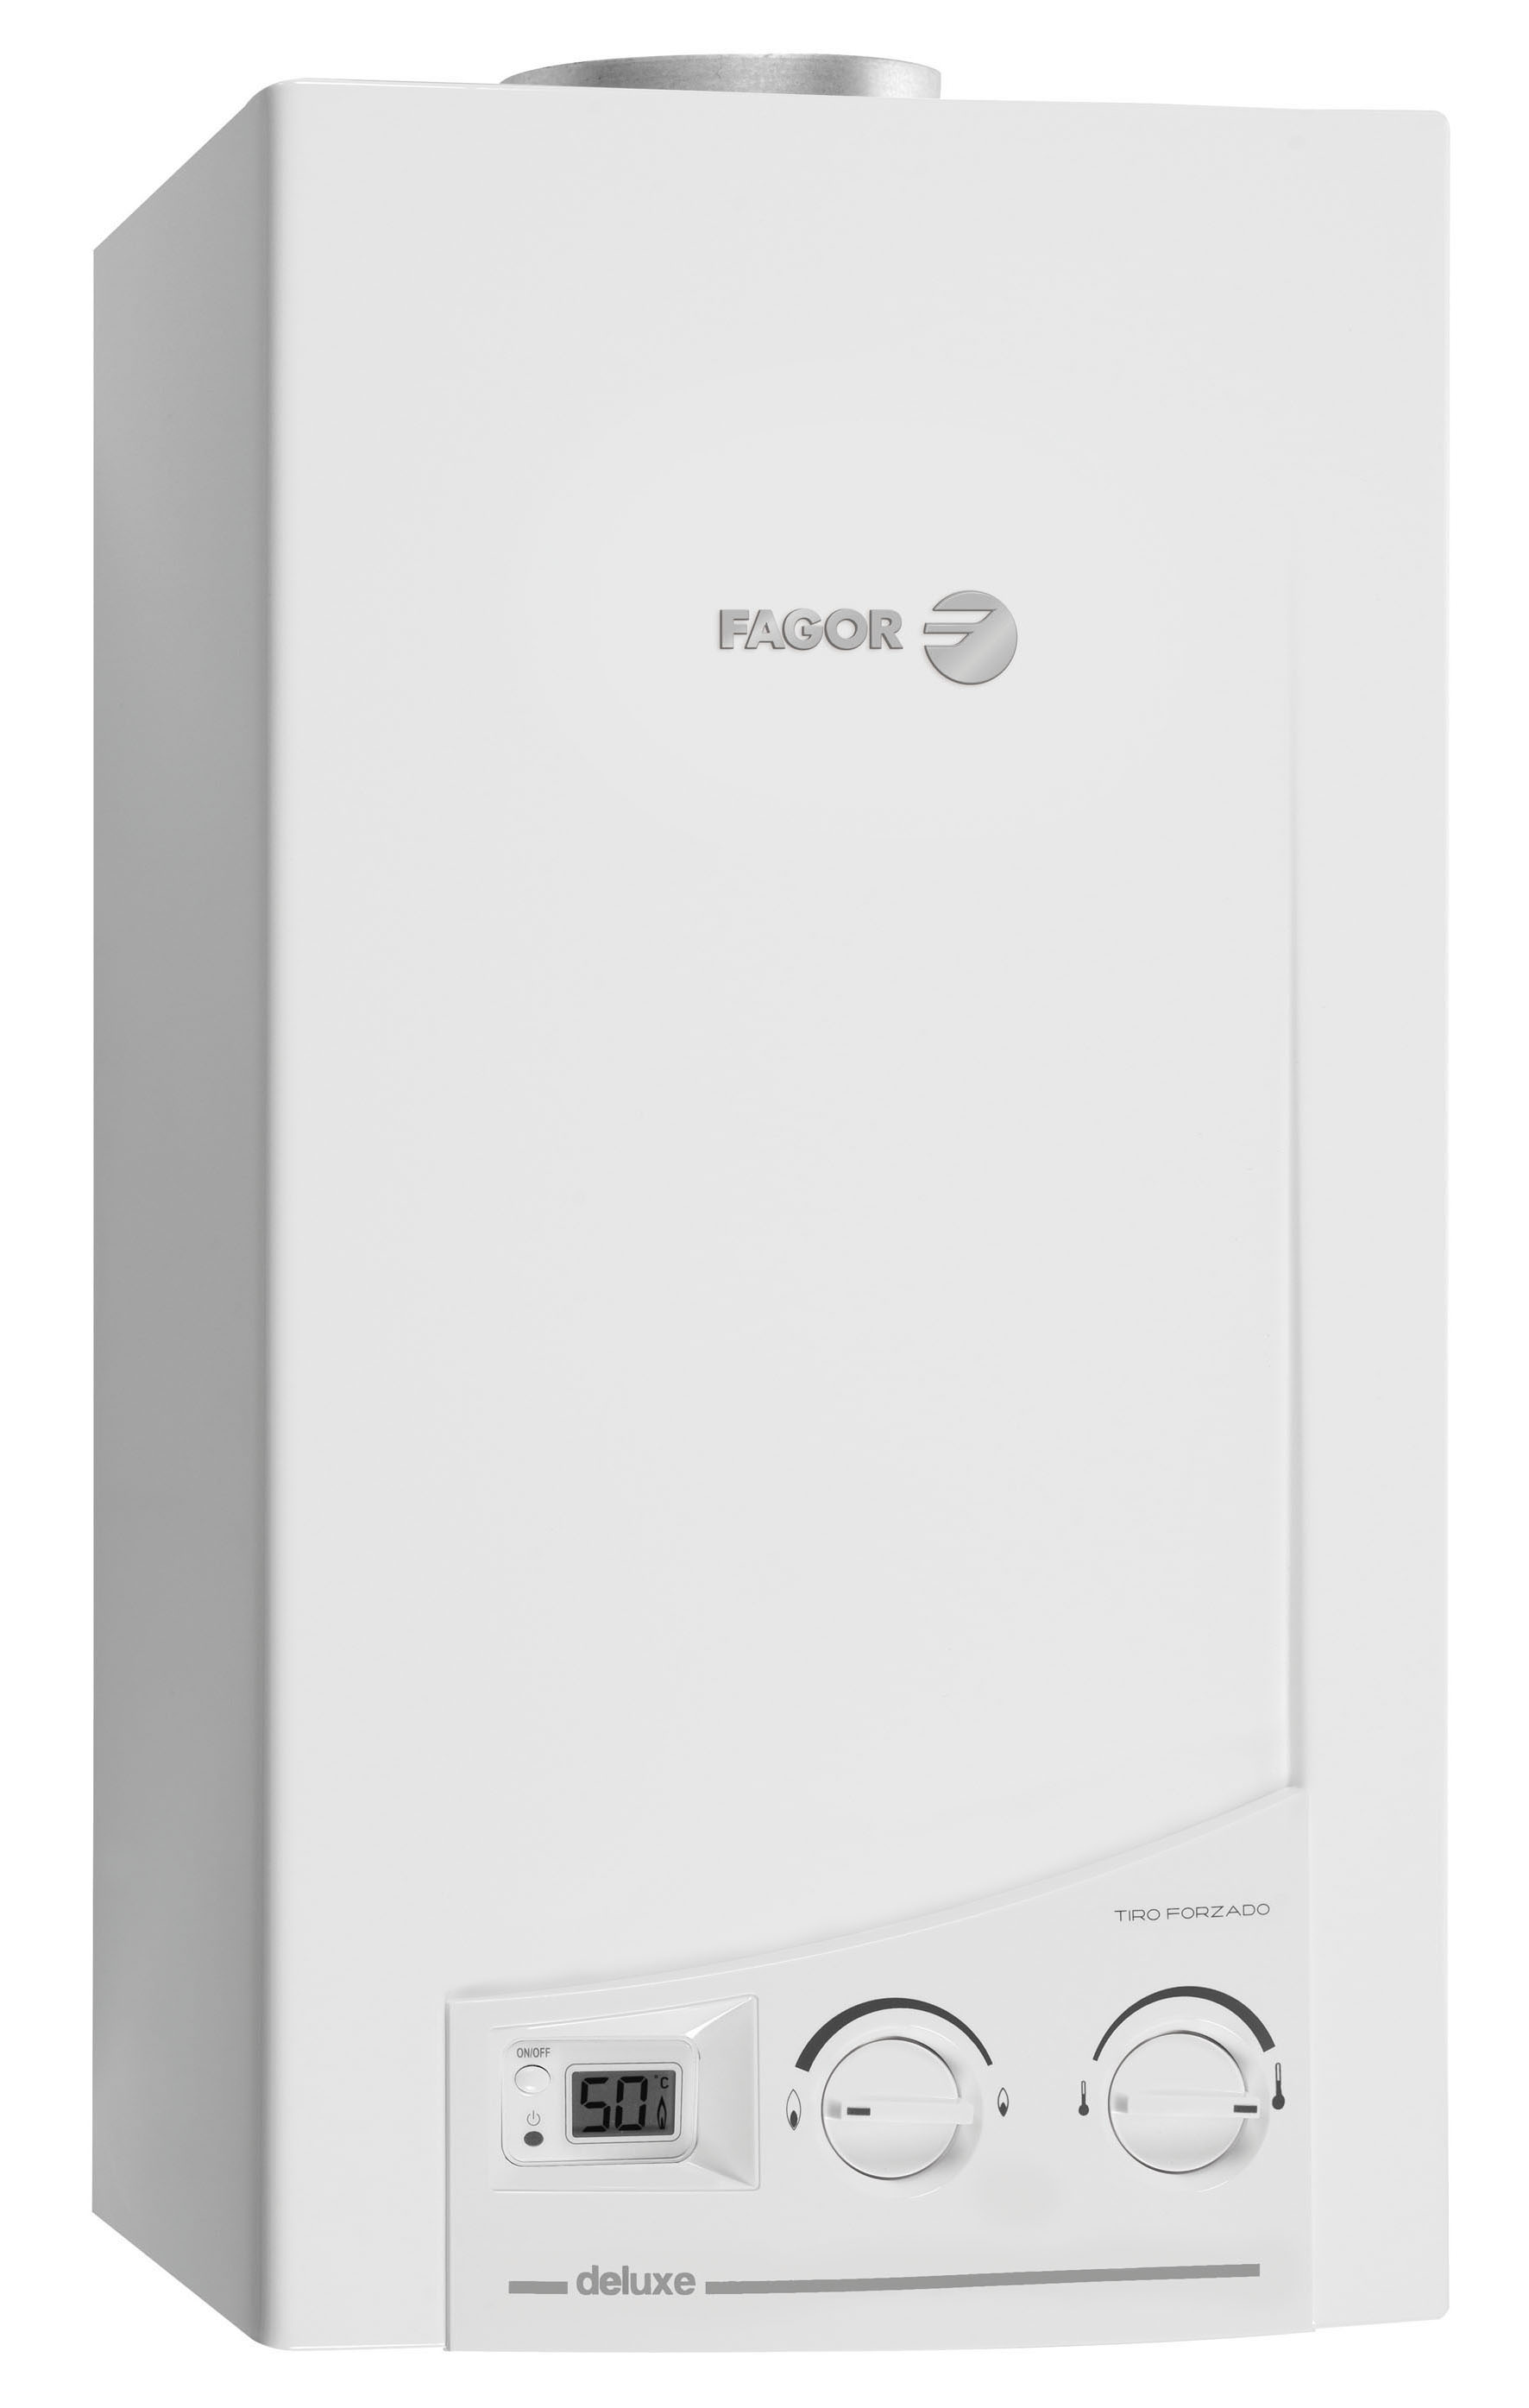 Calentador de agua a gas fagor fe 11 dl n - Calentador gas natural precio ...